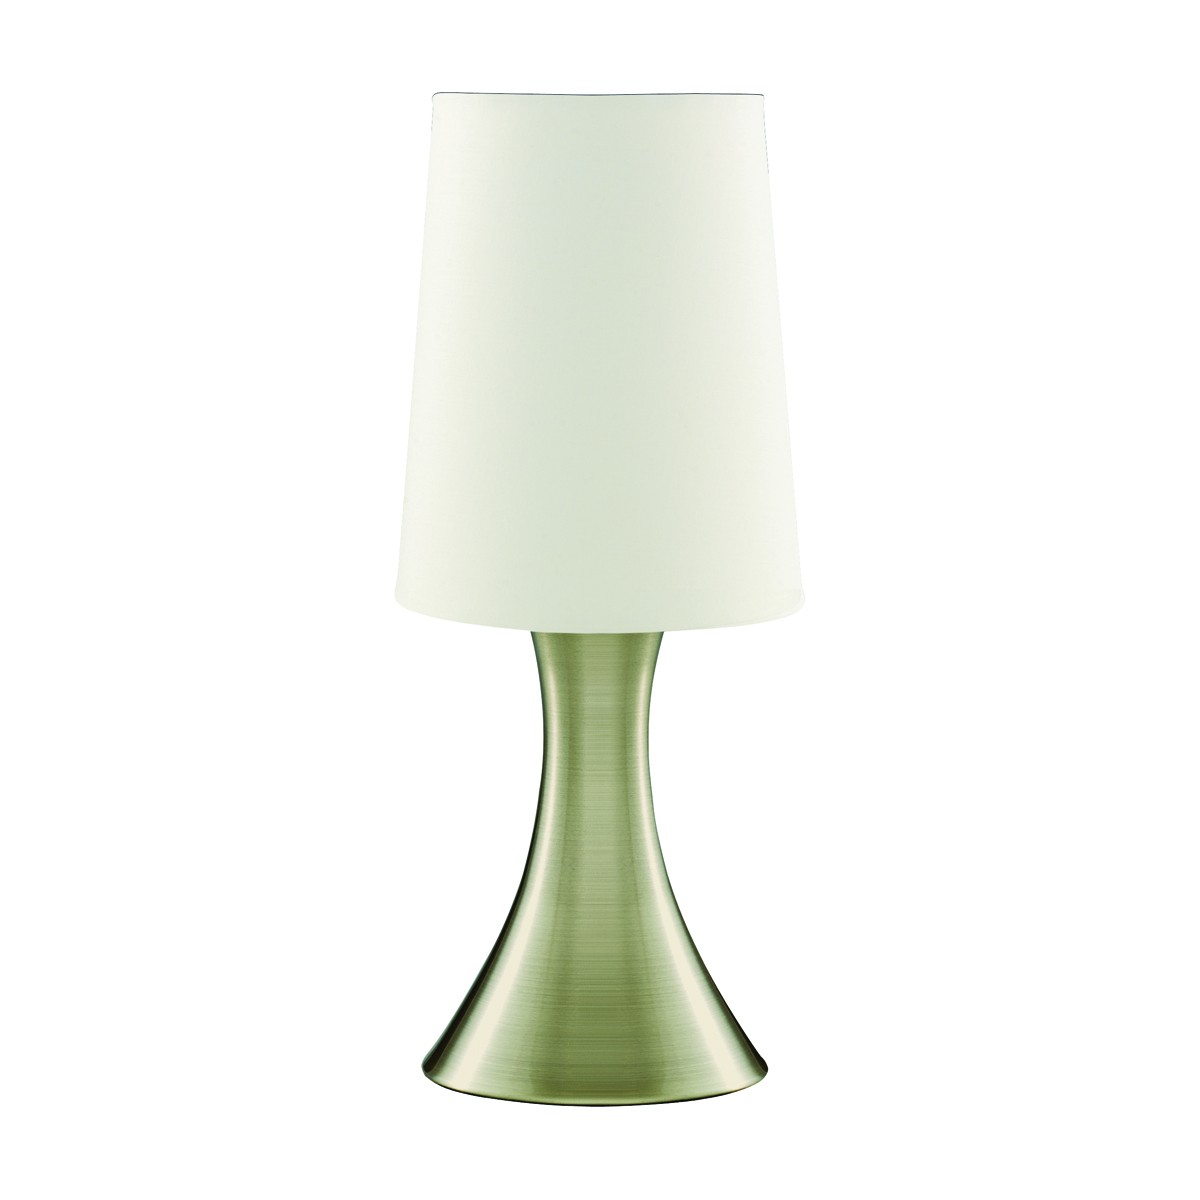 Searchlight EU3922AB TOUCH LAMPS dotyková lampička 1xE14